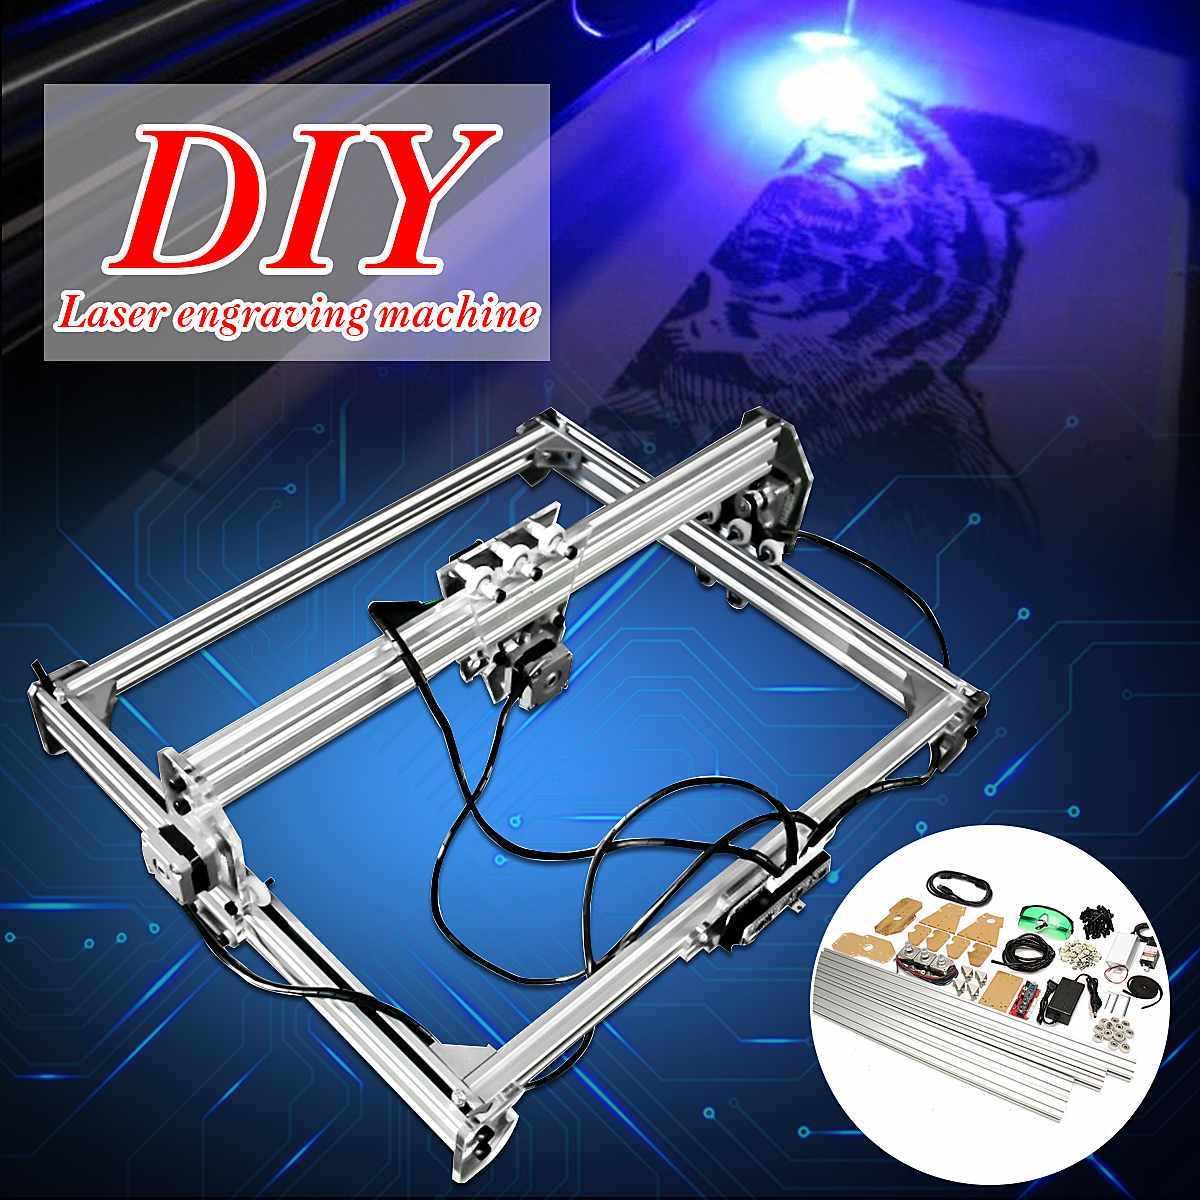 Máquina de grabado láser de 50x65 cm de 15W CNC para enrutador de Metal/madera/cortador de bricolaje 2 eje grabador cortador de escritorio + láser